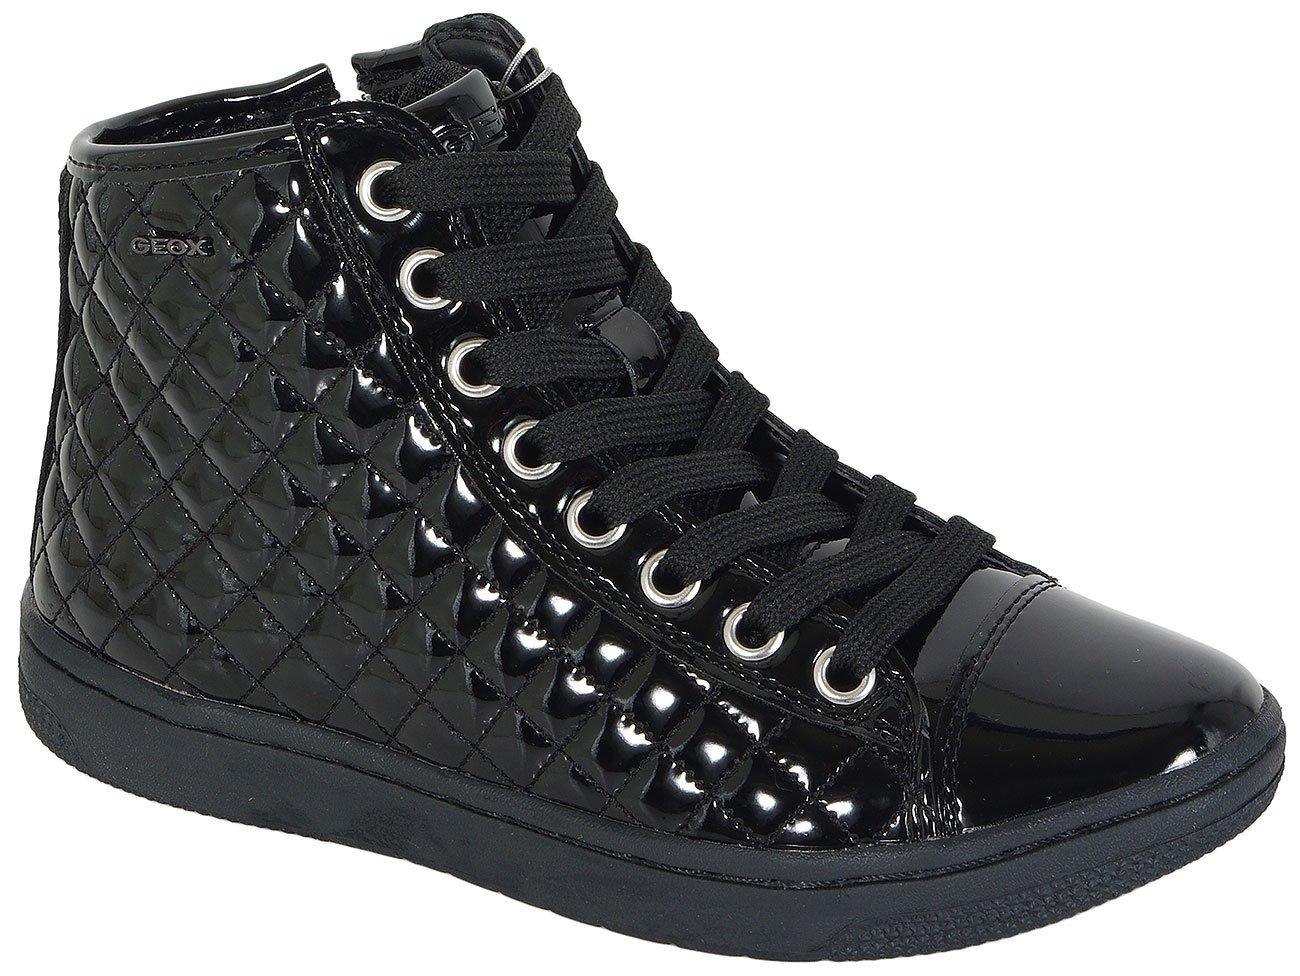 GEOX CREAMY D sneakers SYNT.PAT BLACK